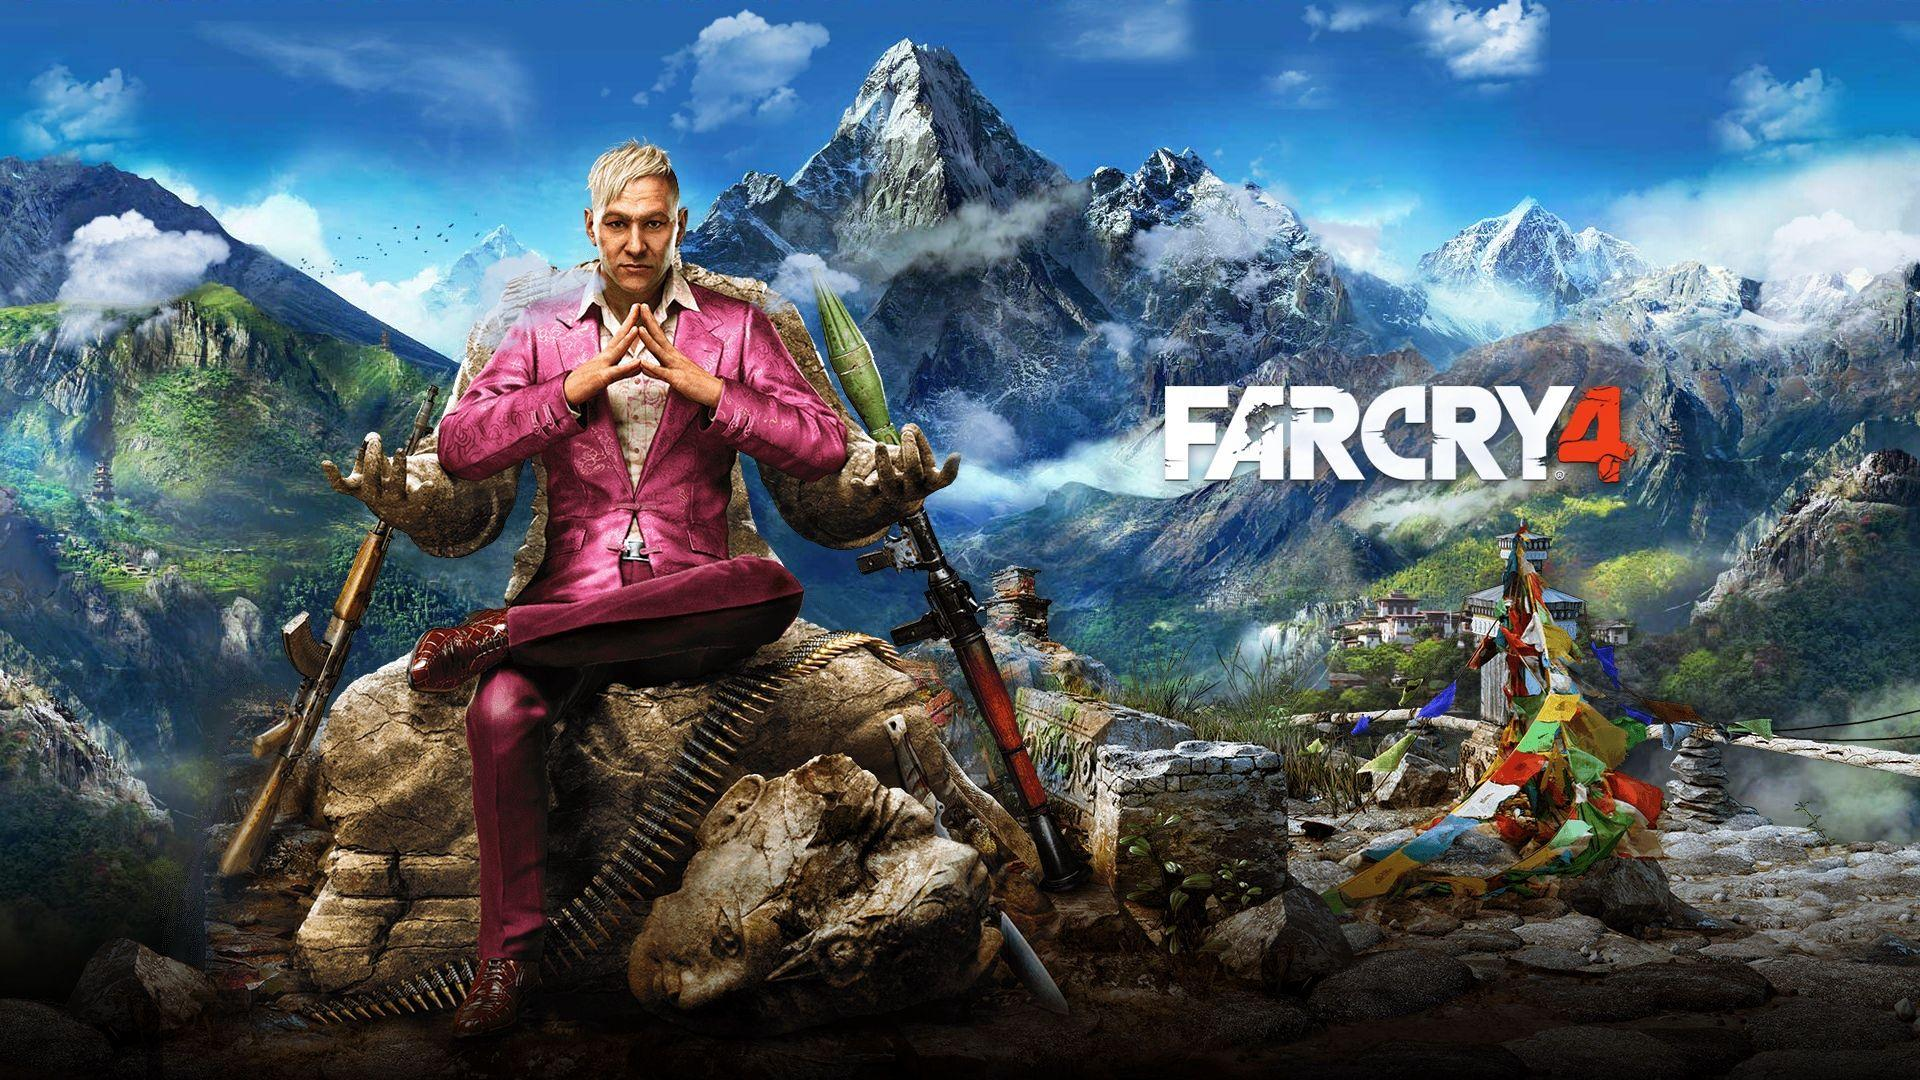 Far Cry 4 Game Desktop Wallpaper_31335